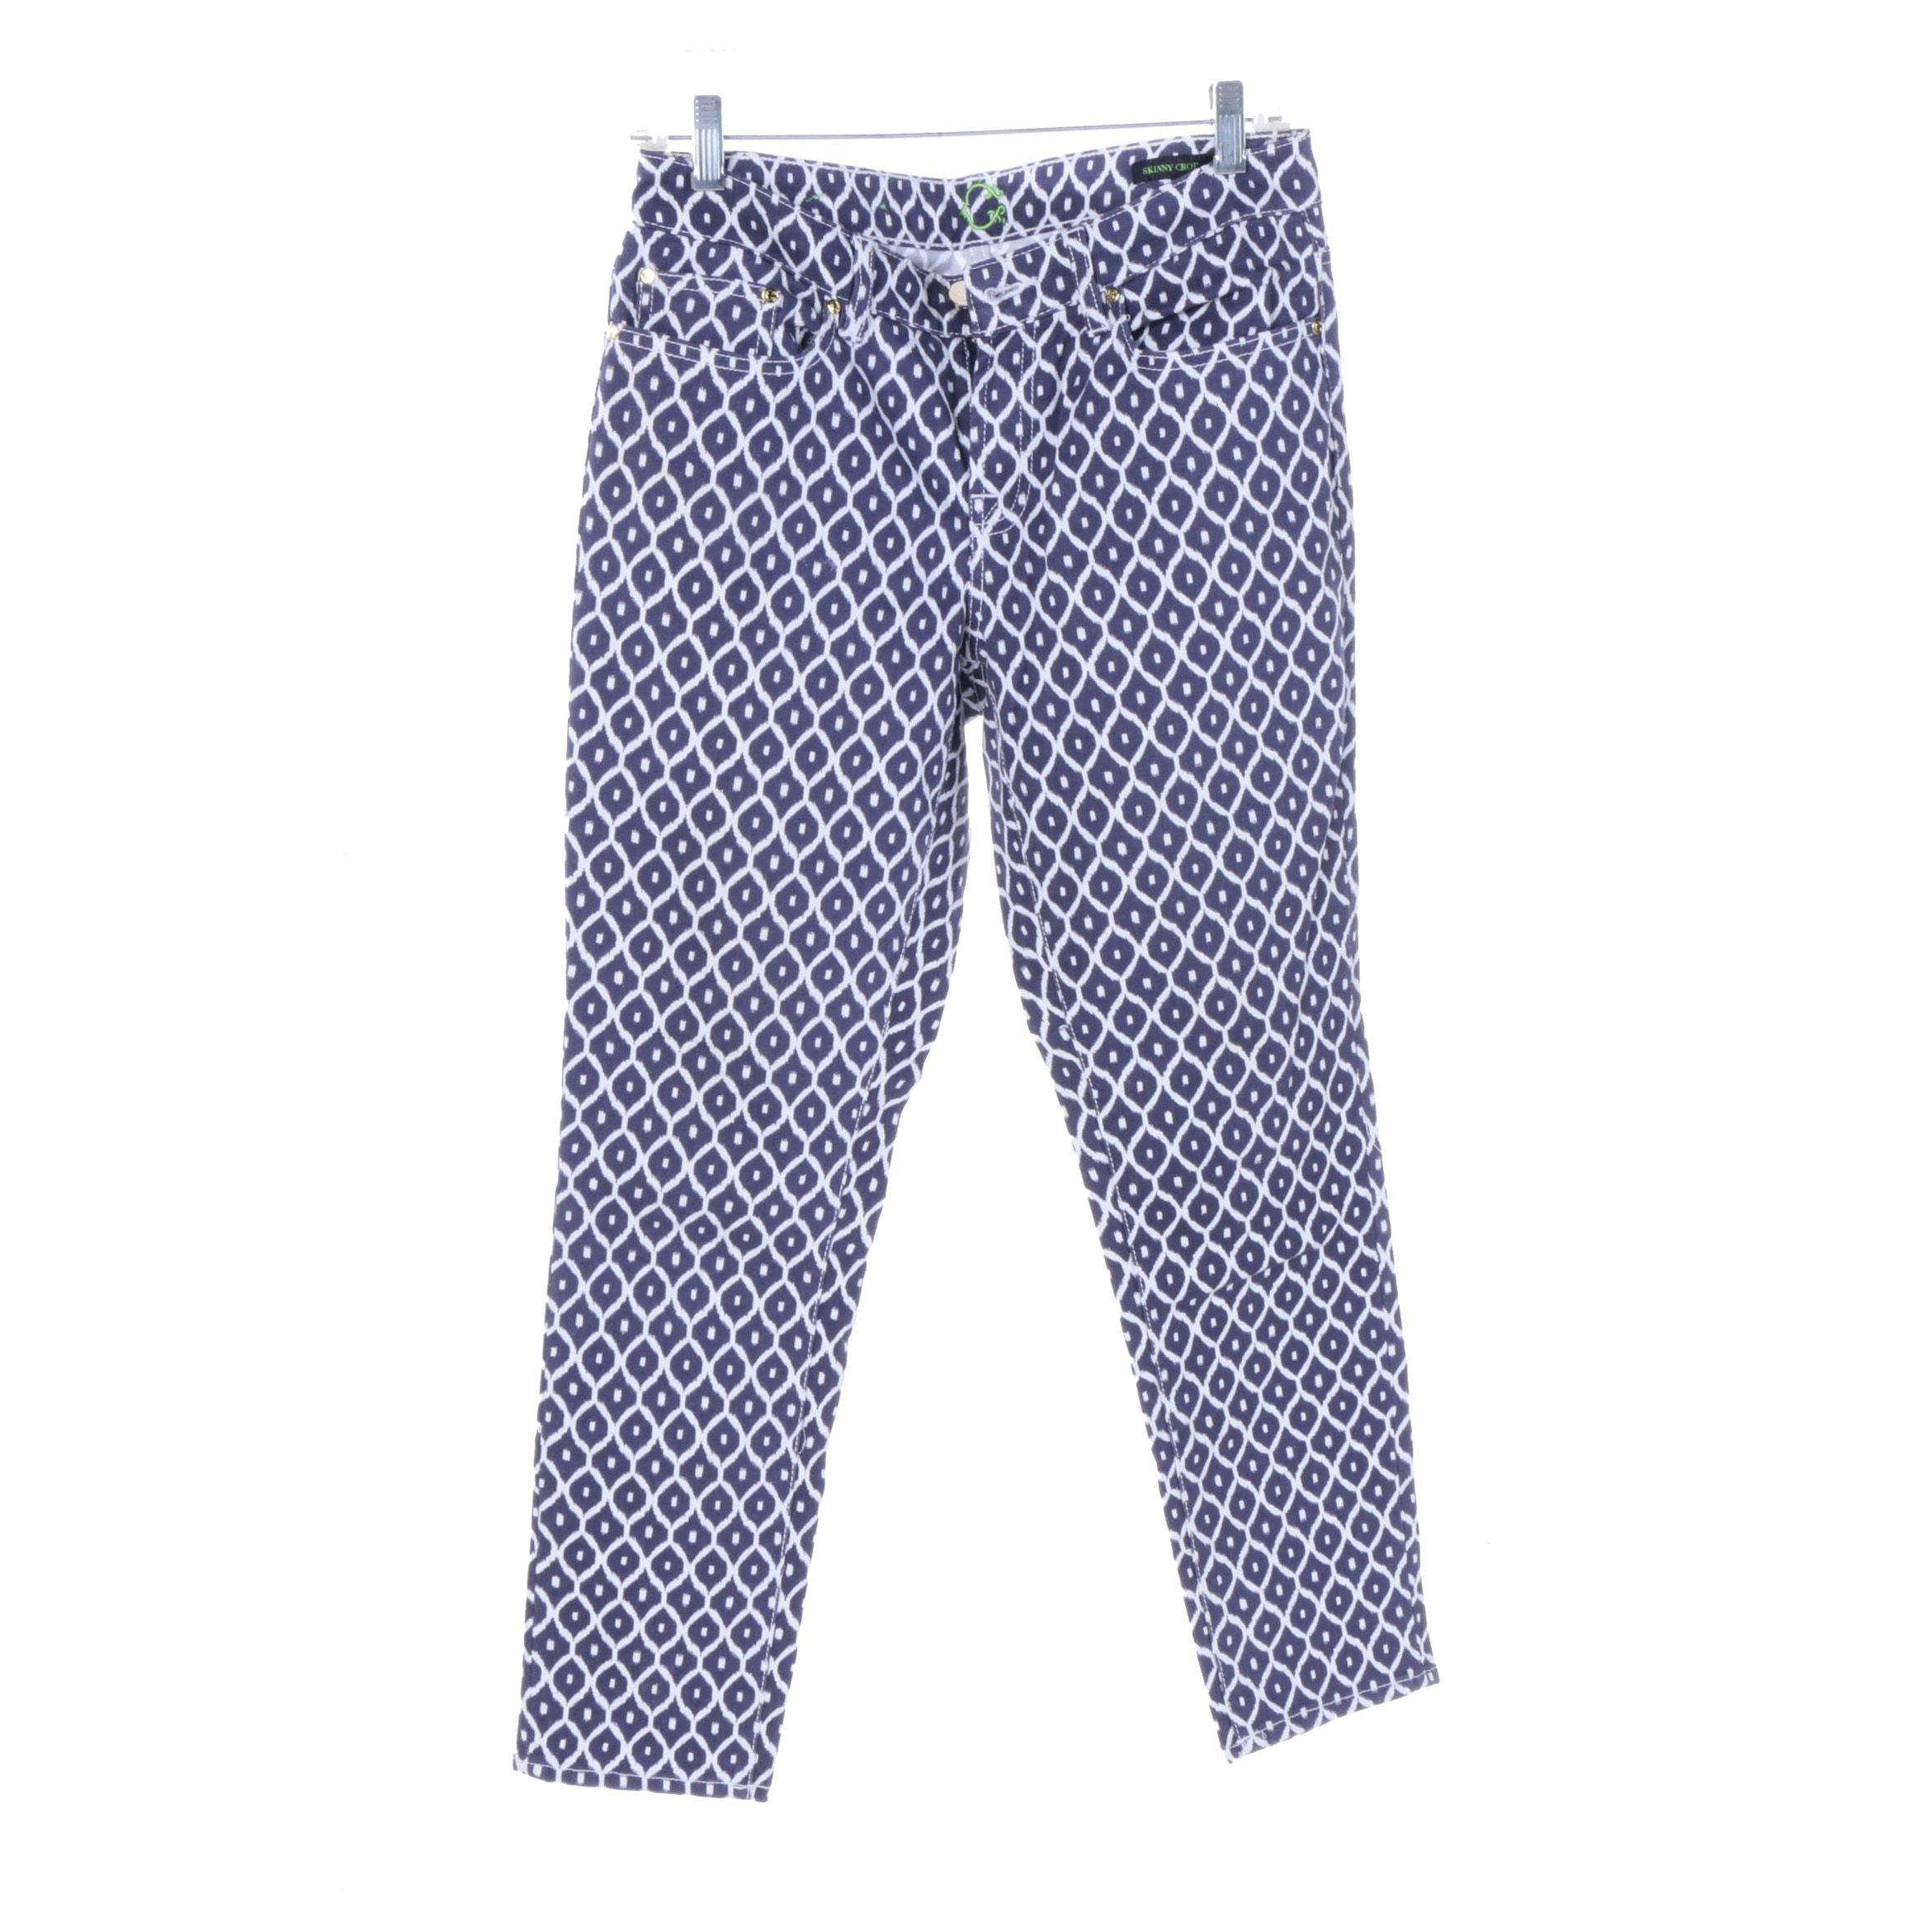 Women's Charming Charlie Diamond Printed Skinny Jeans